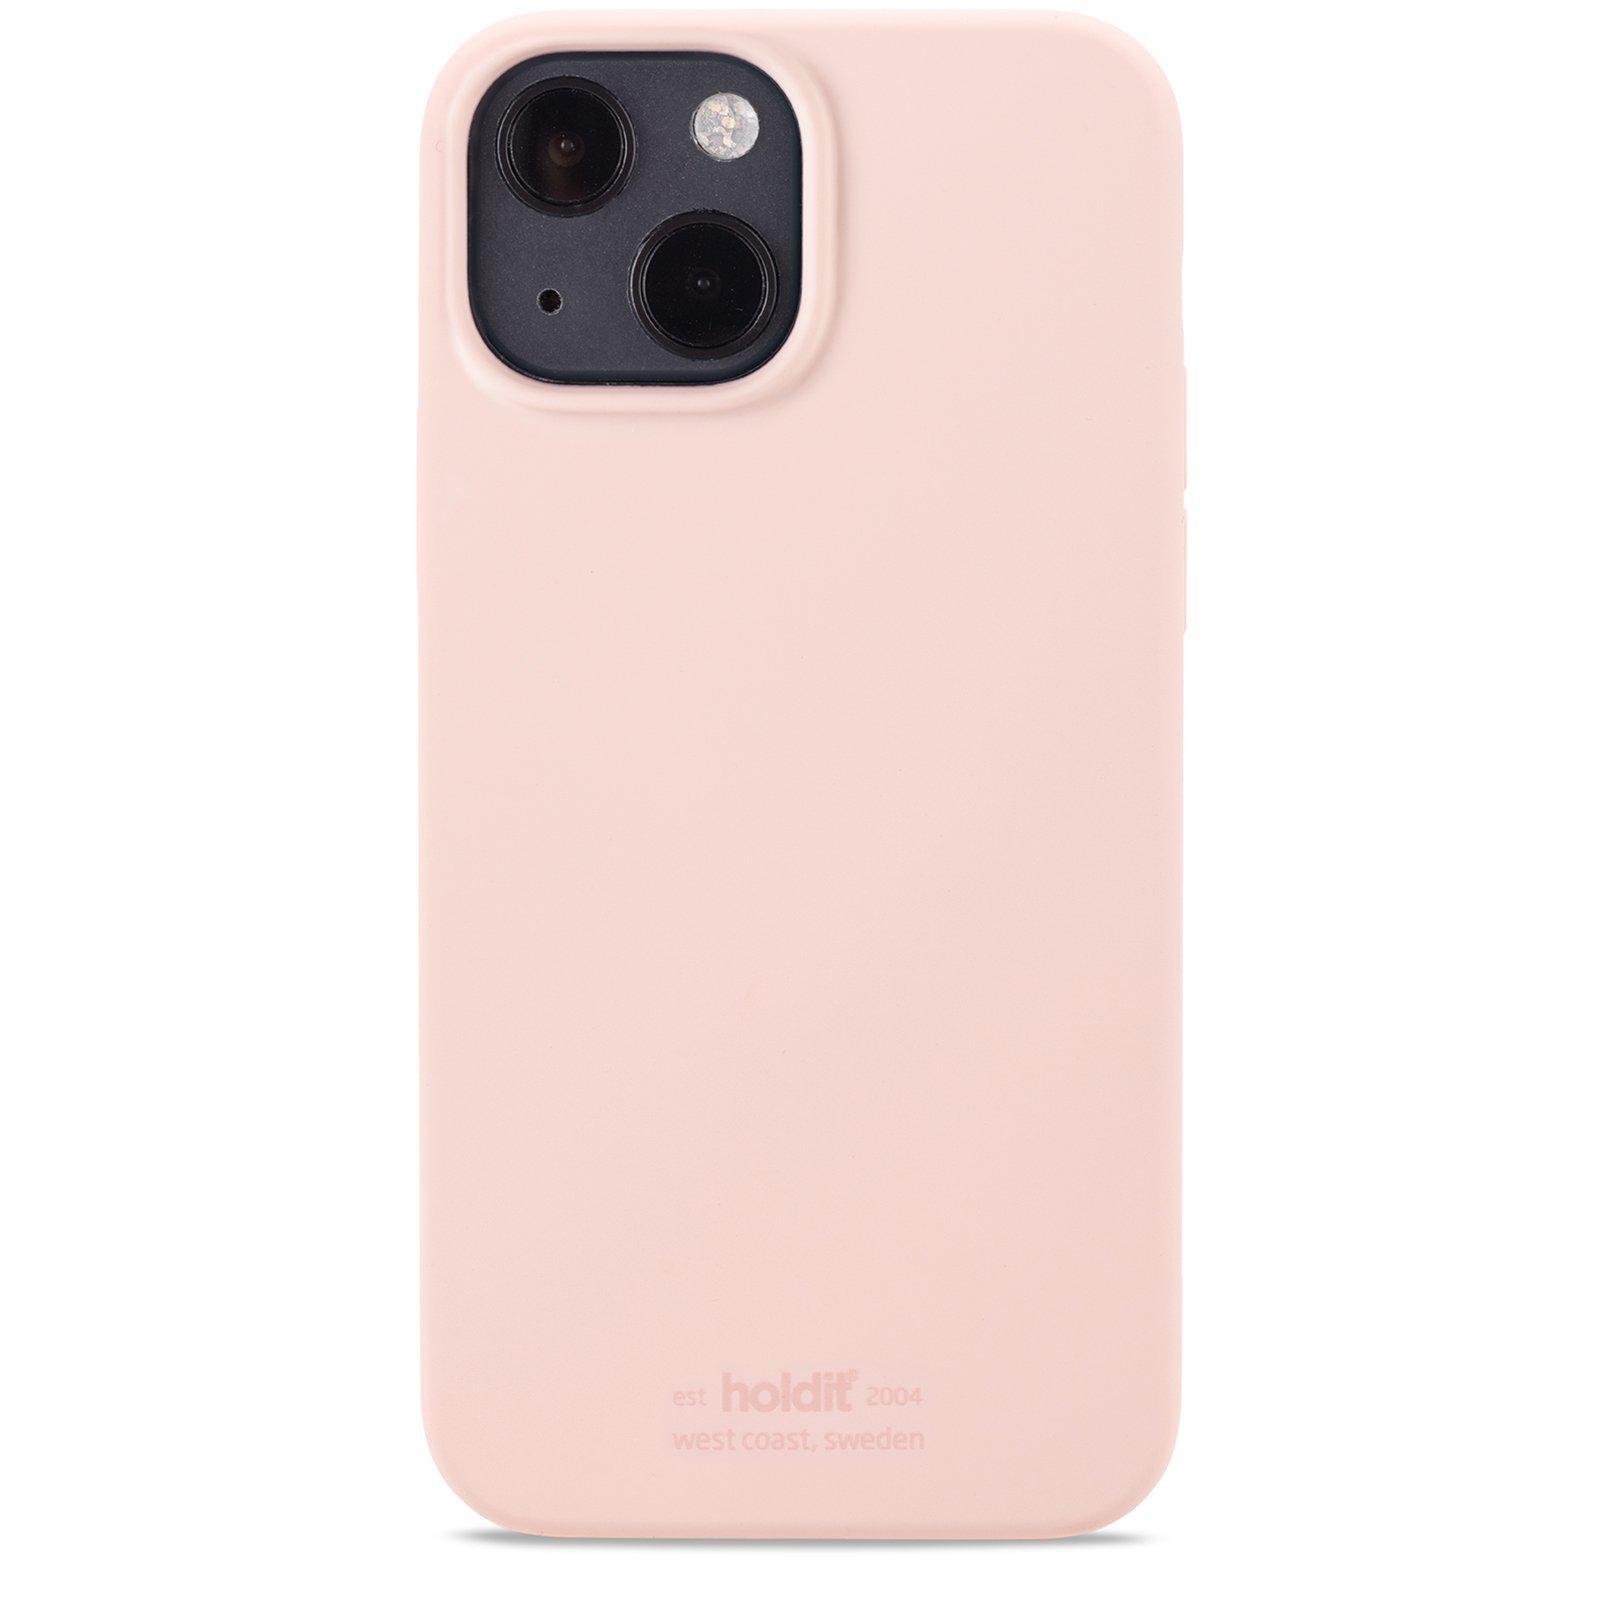 Silikonskal iPhone 13 Mini Blush Pink